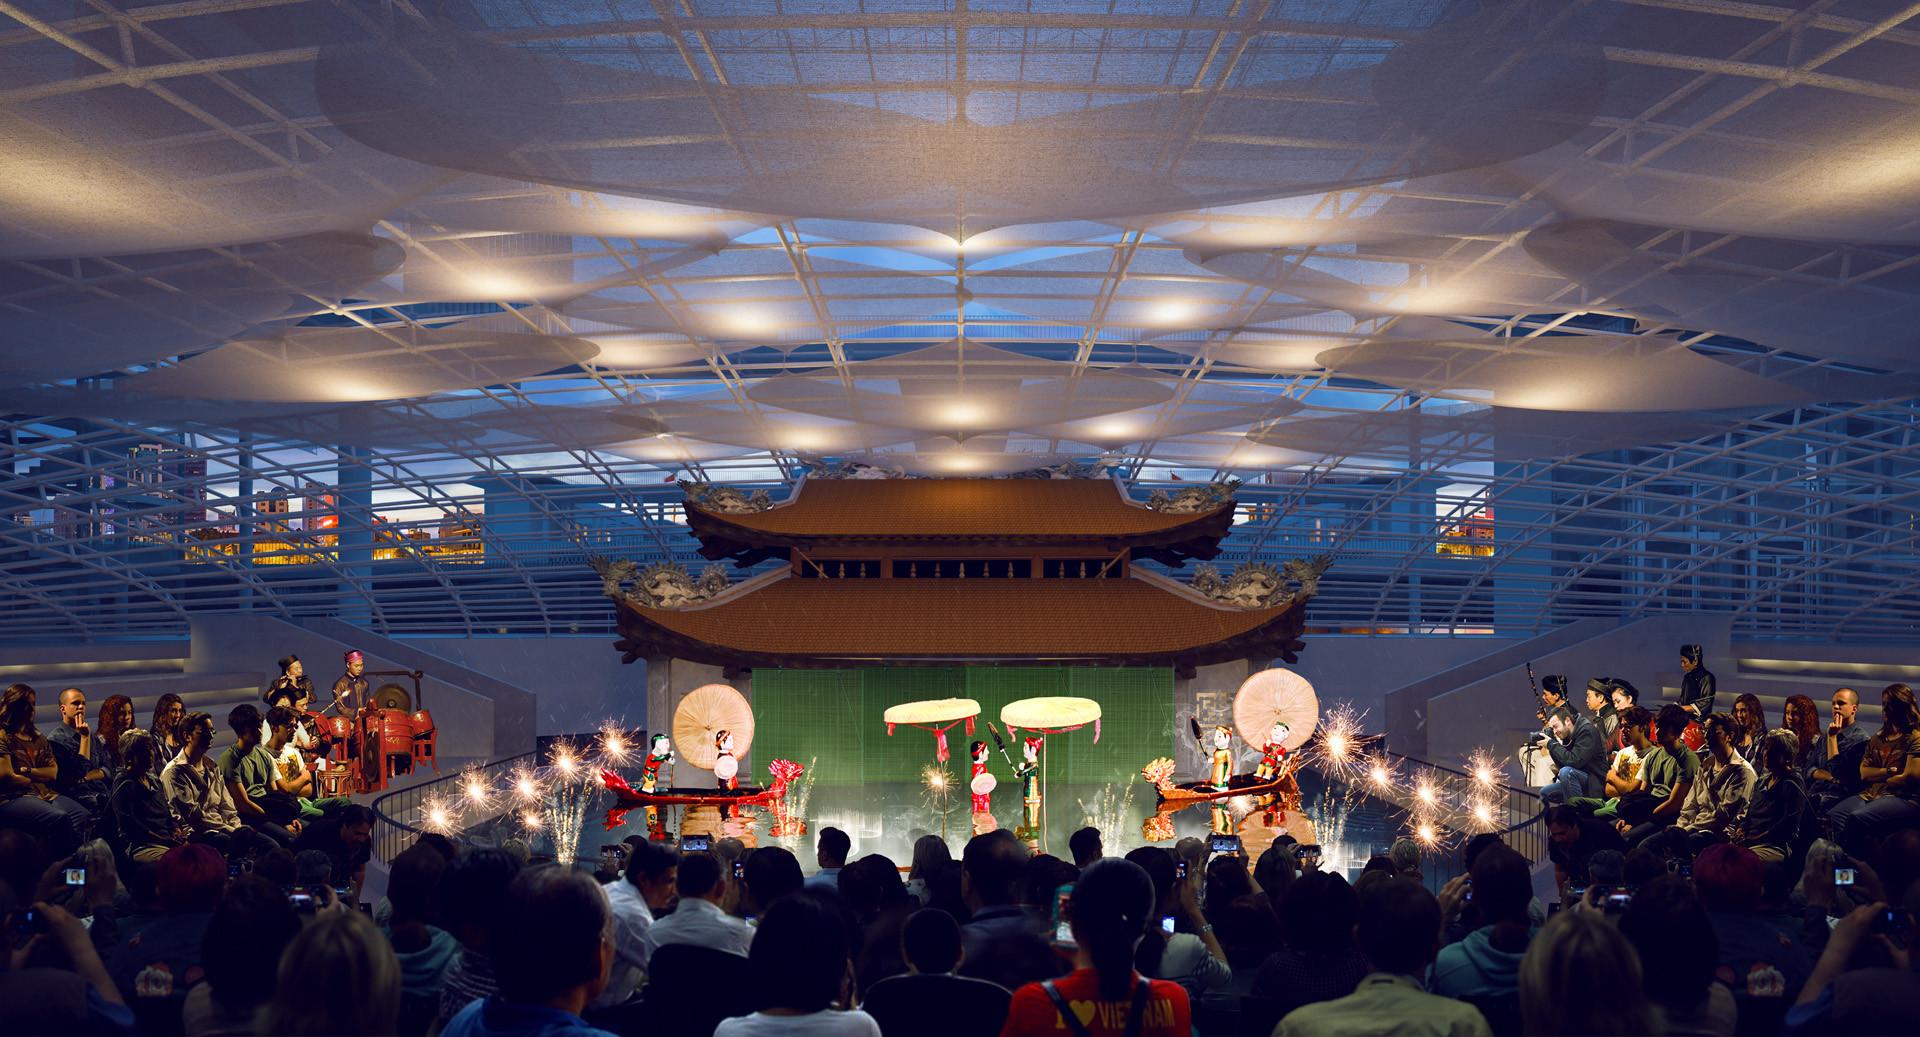 lnd_saigonculturalcenter (15).jpg